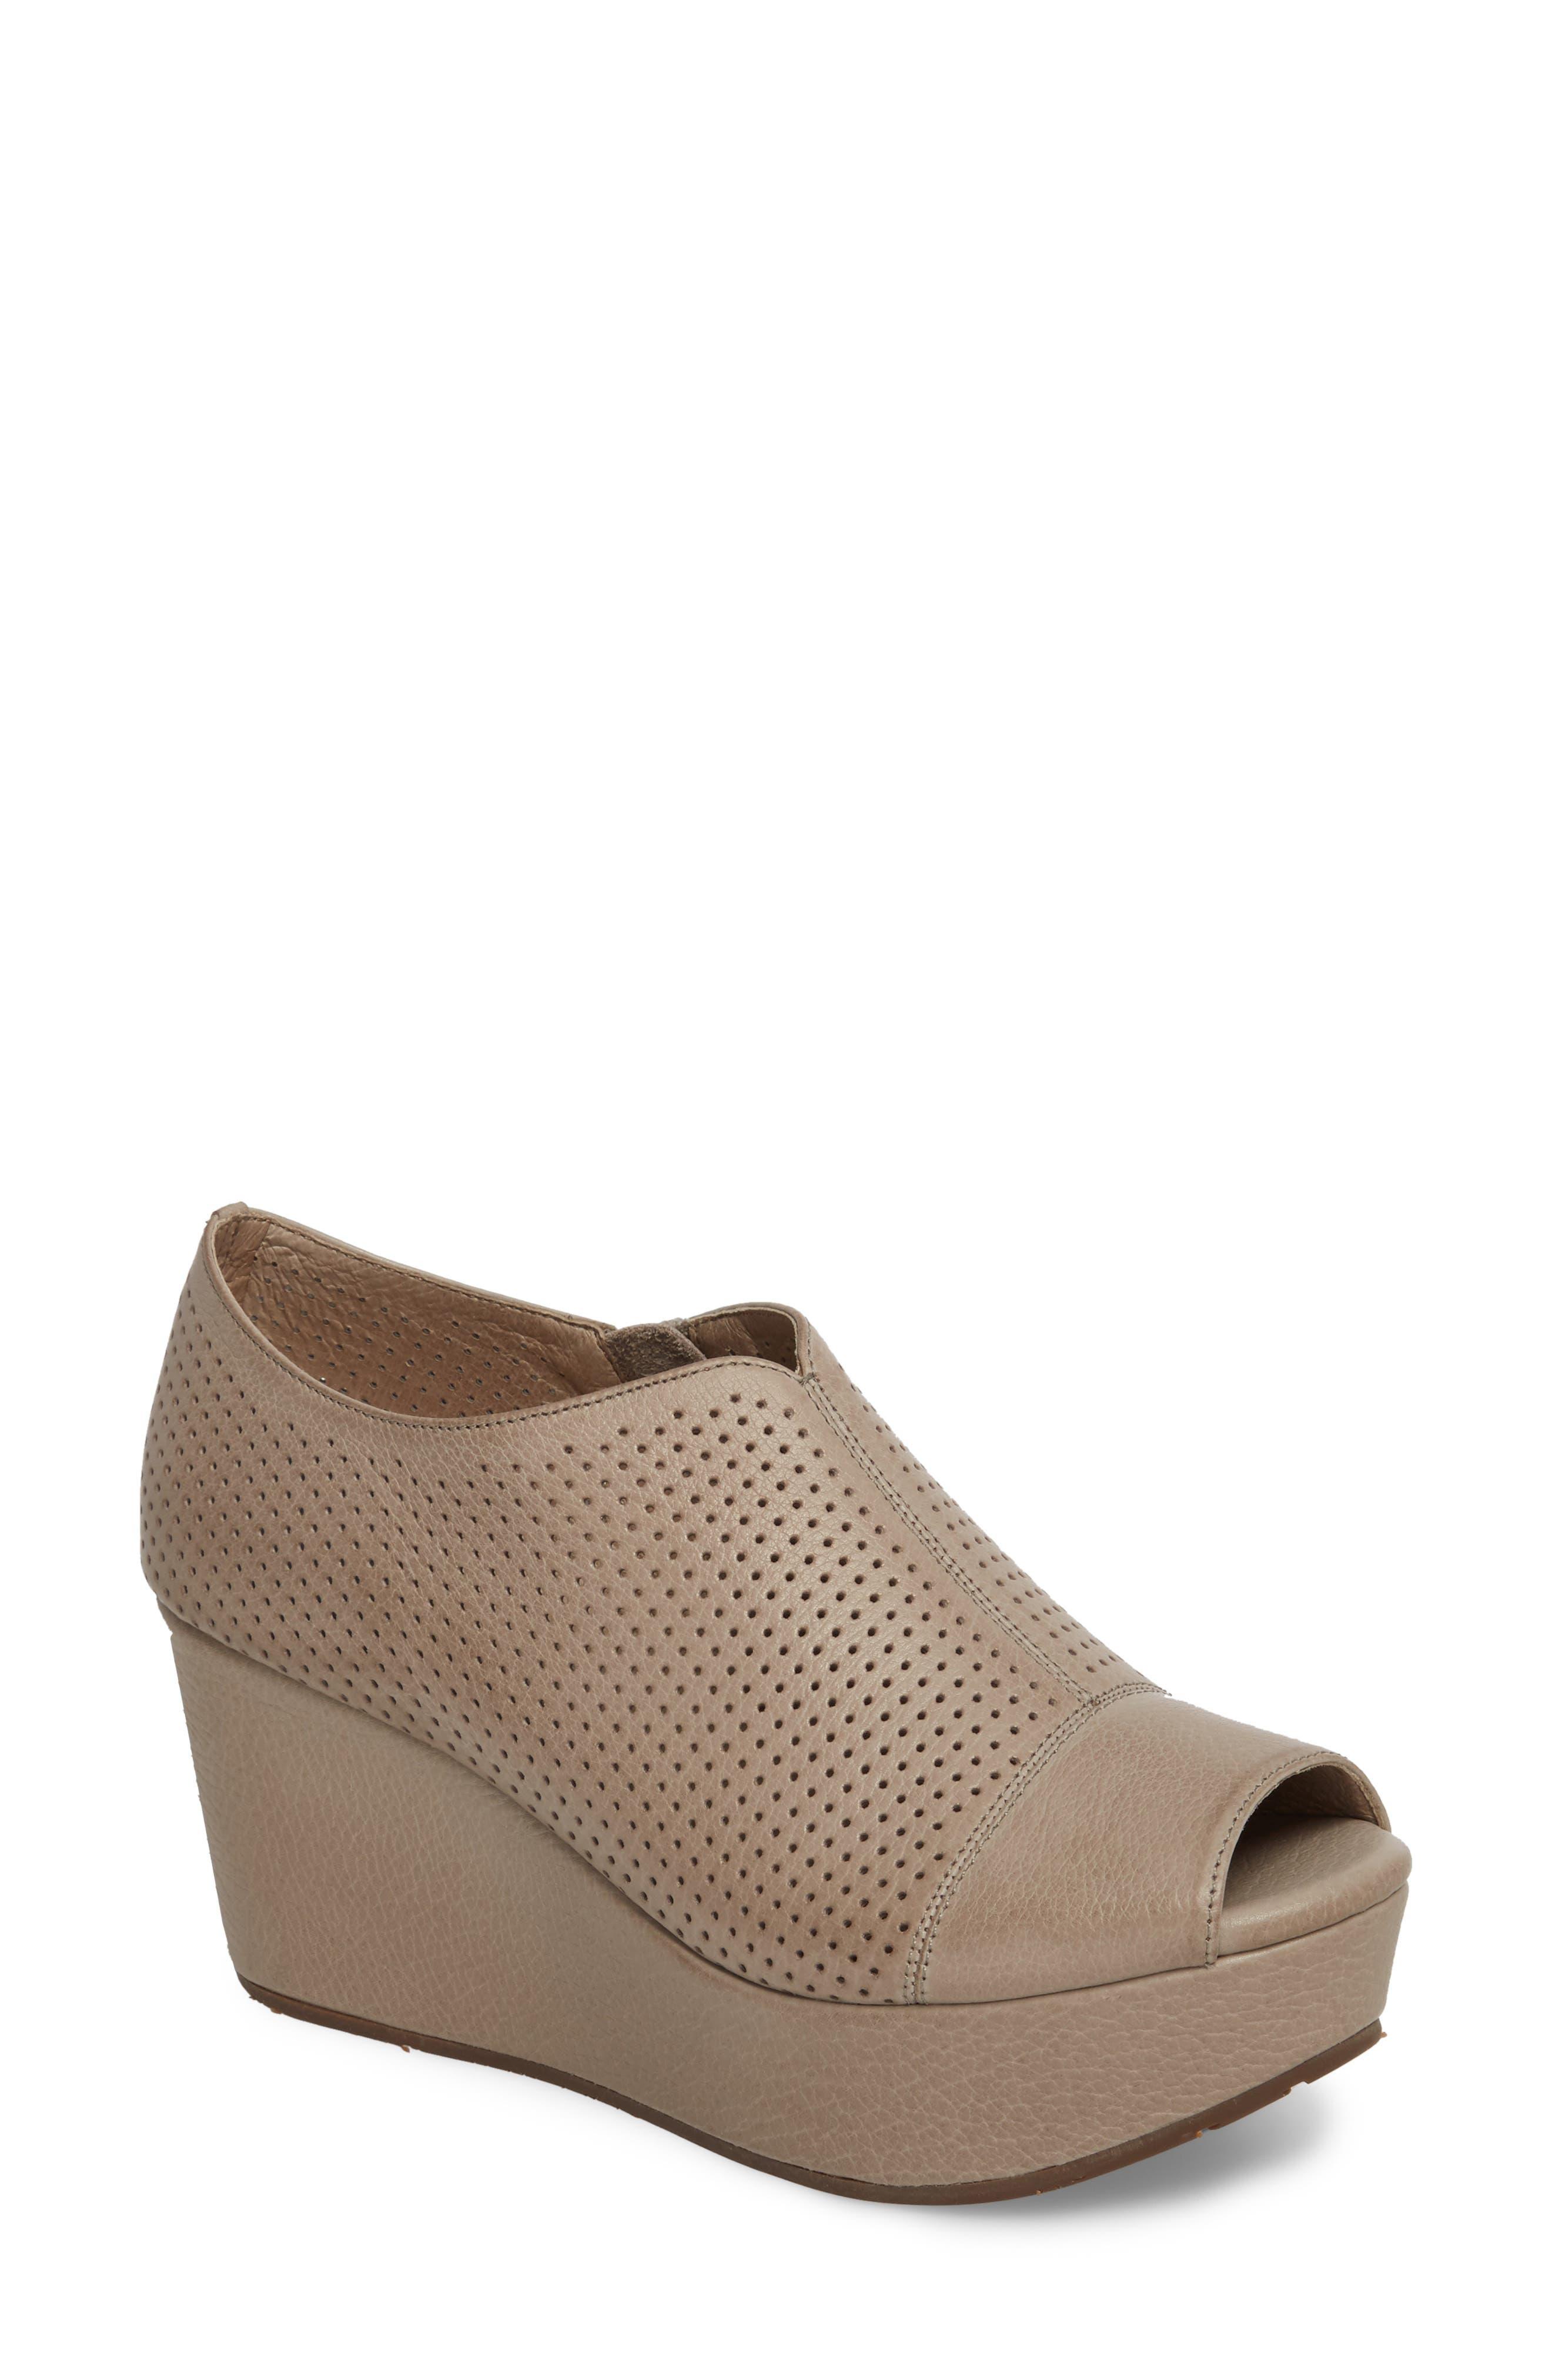 Wheeler Wedge Sandal,                             Main thumbnail 1, color,                             Grey Leather